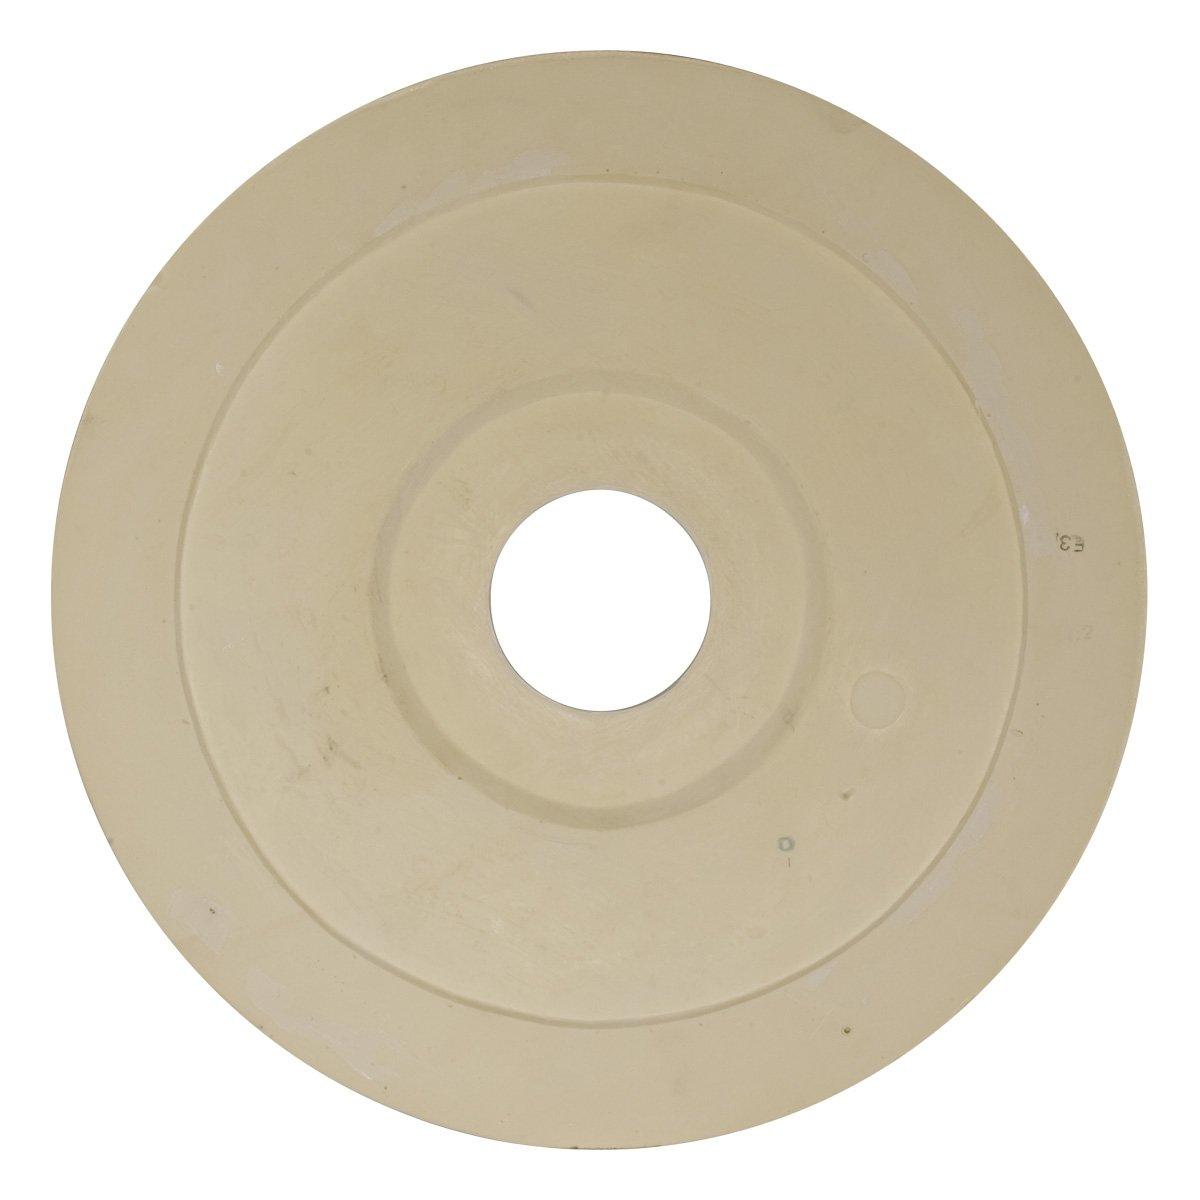 Amazon.com: Ekena Millwork CM18DI Ceiling Medallion Primed: Home ...